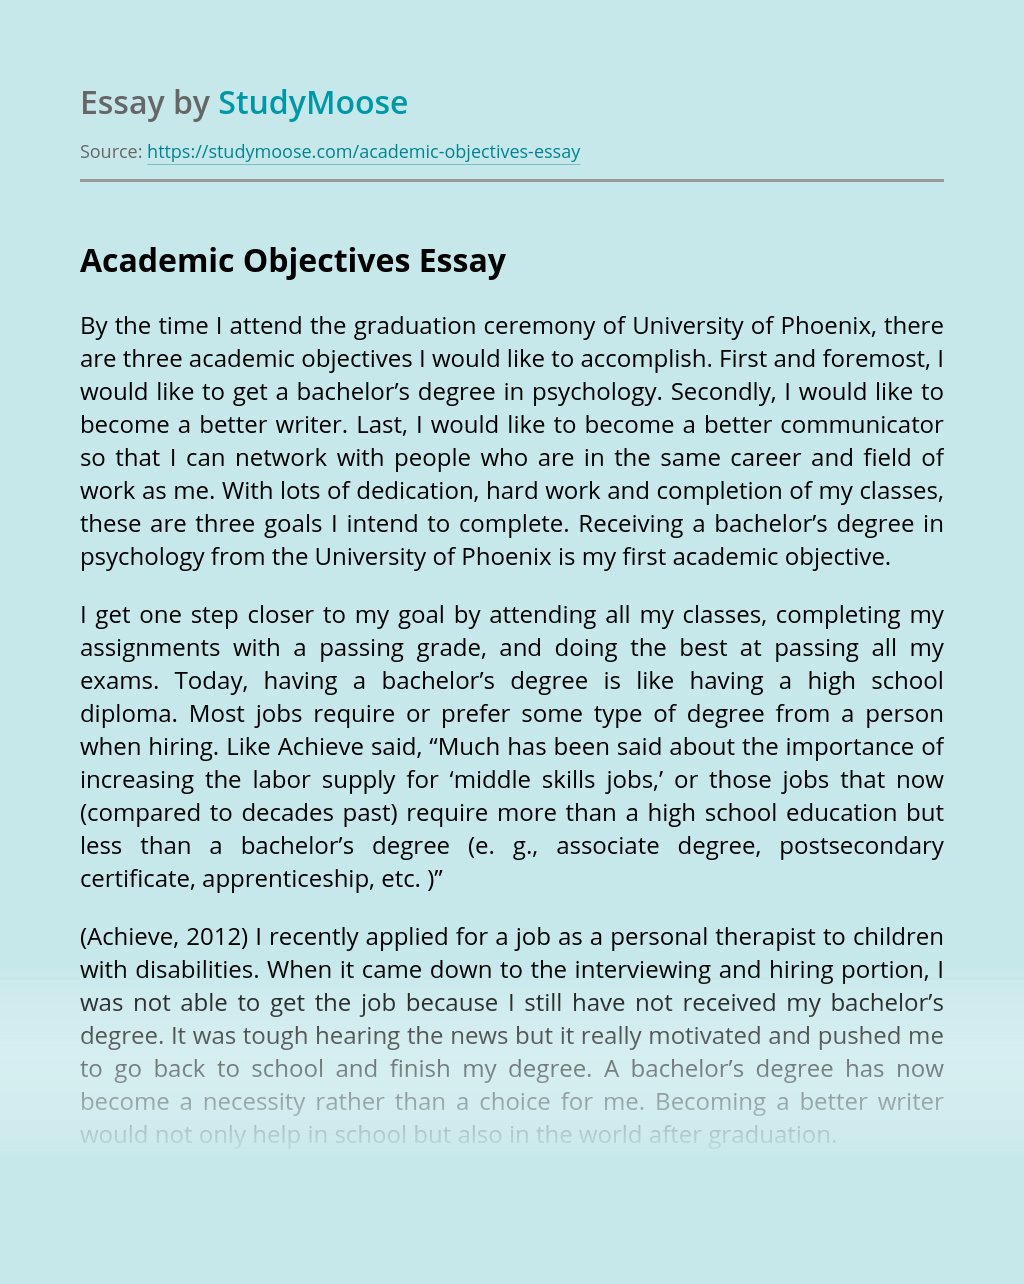 Academic Objectives